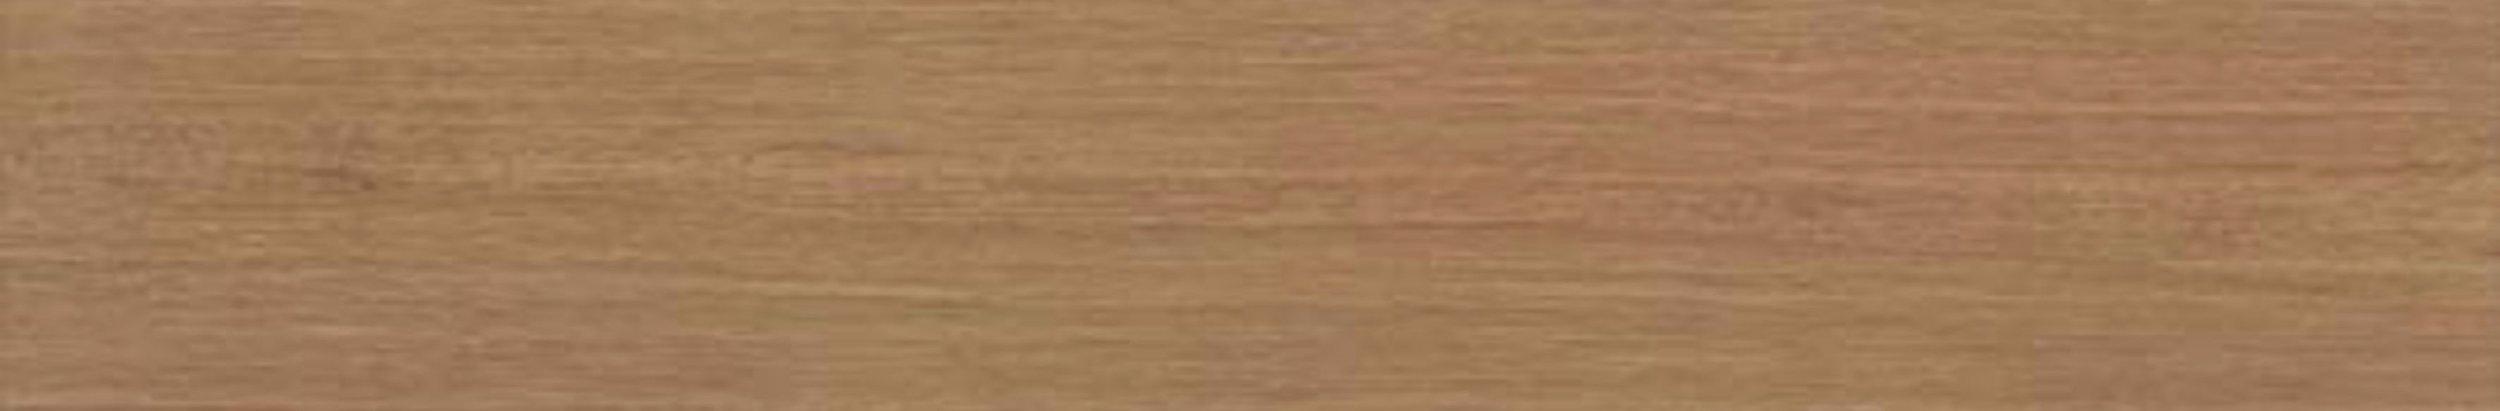 Atmosfera Miel 14.8x90 cm